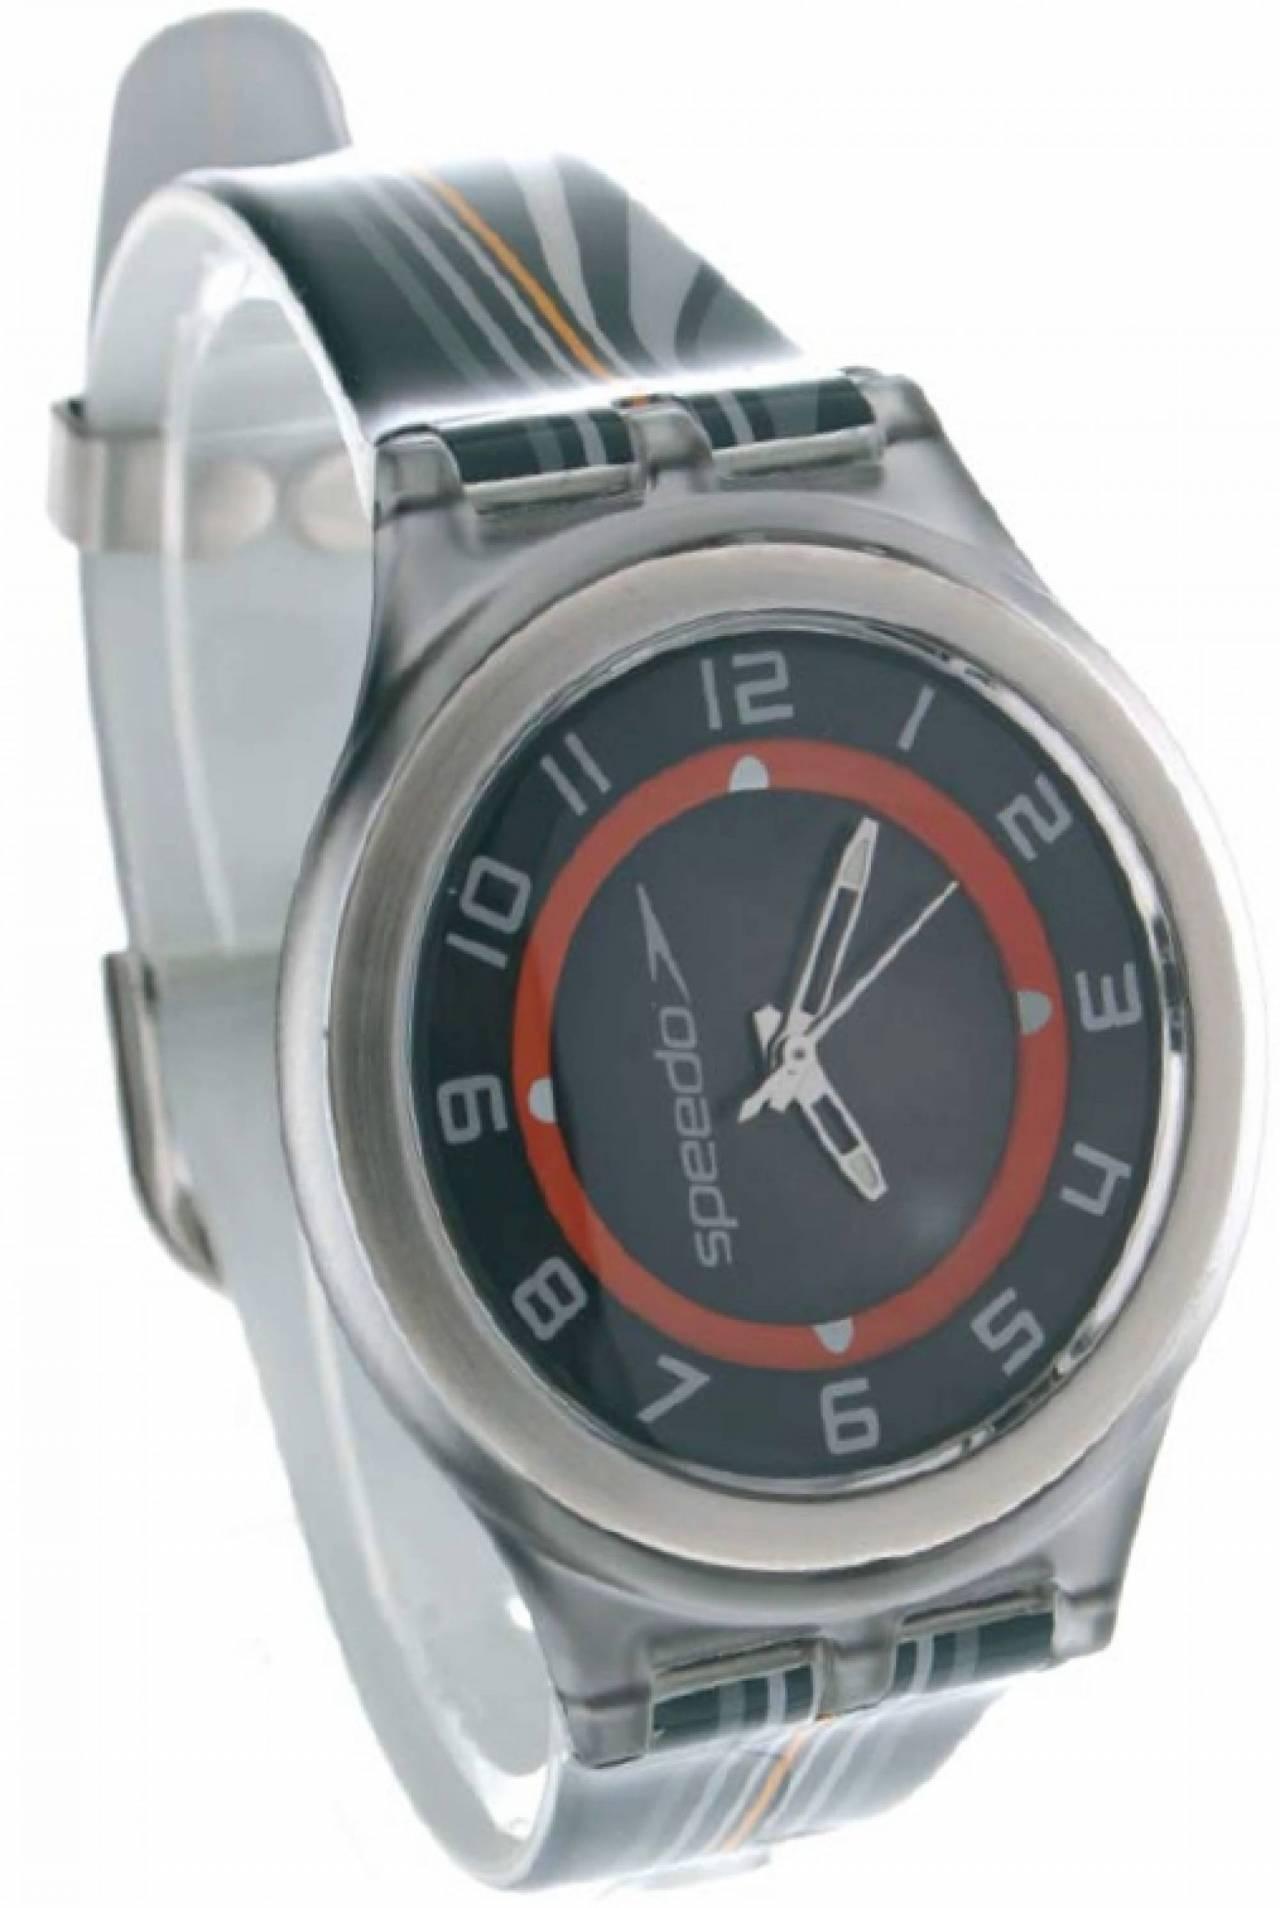 Speedo Uhr EXM 1 Series